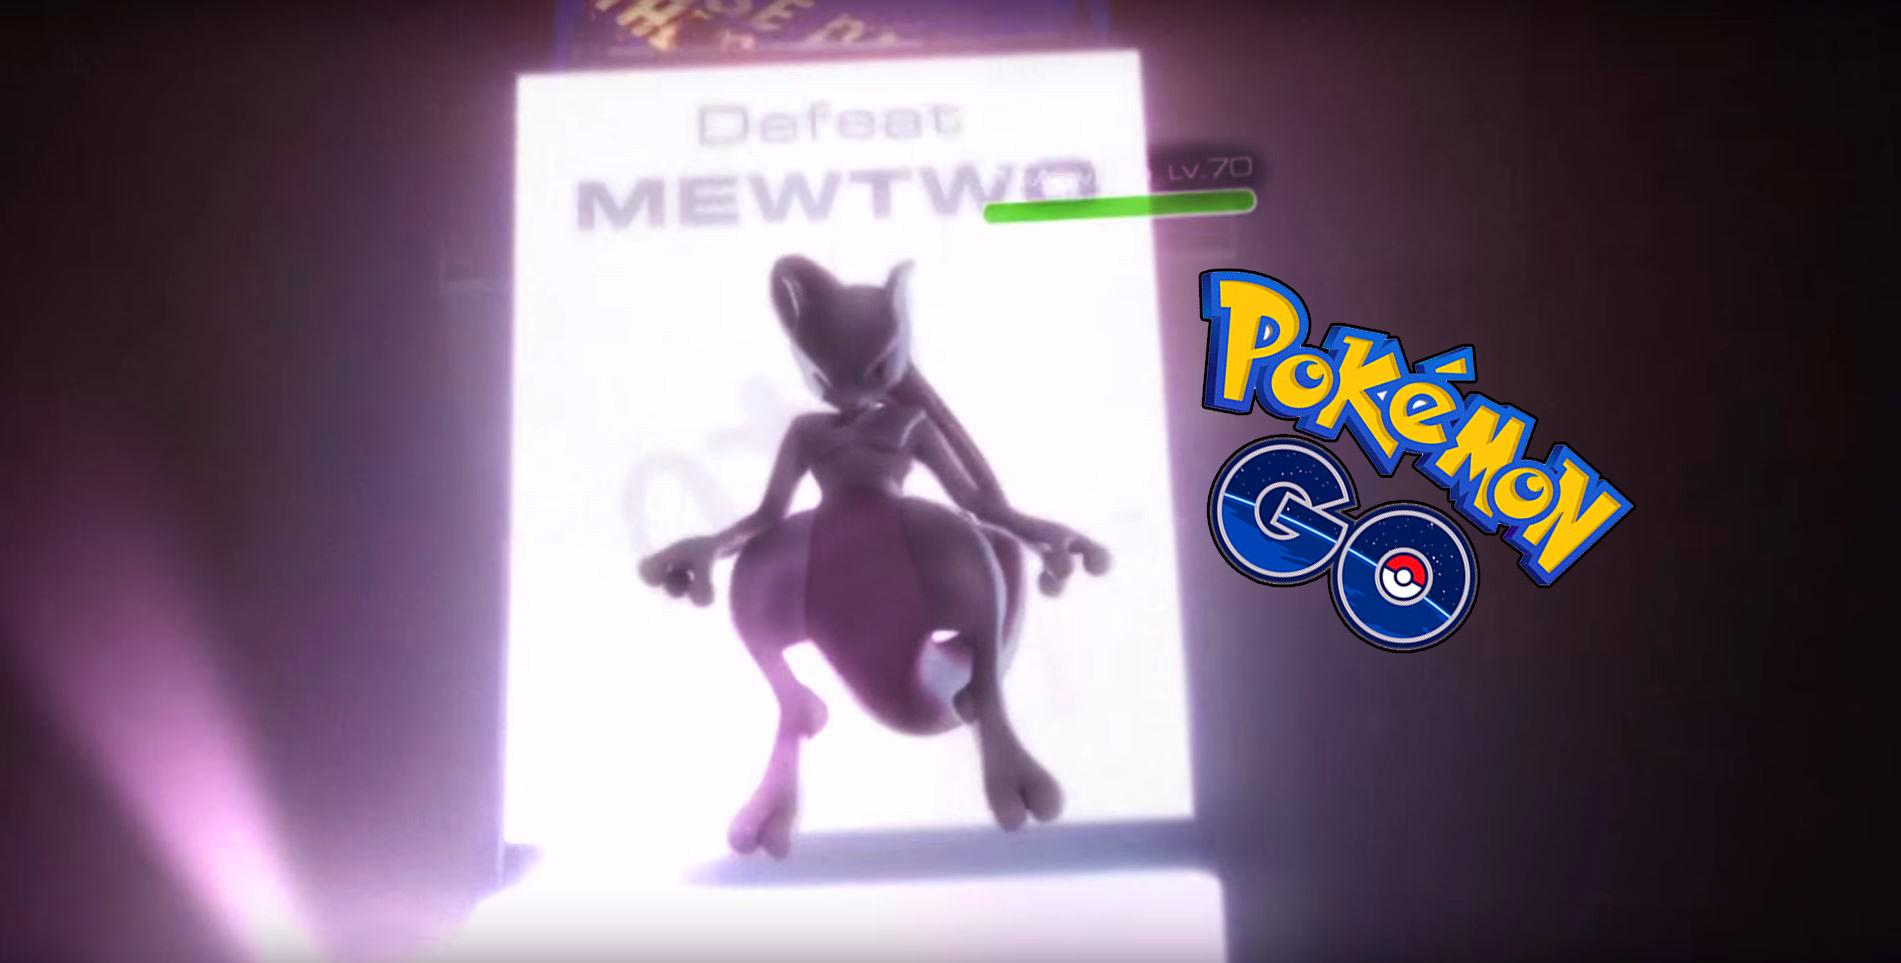 Pokémon GO: Kann man legendäre Pokémon wie Mewtwo fangen?